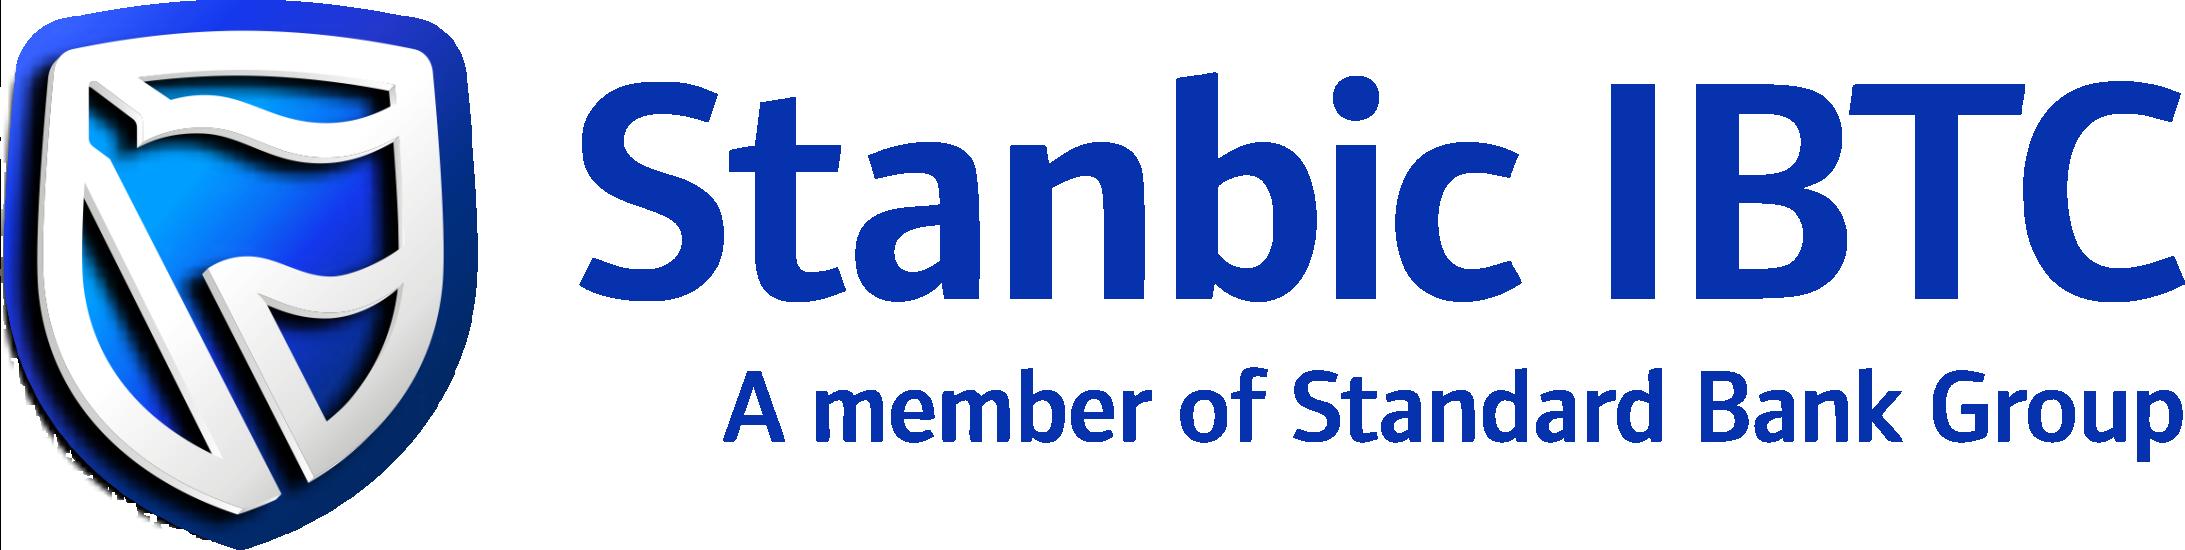 Stanbic IBTC- Investors King